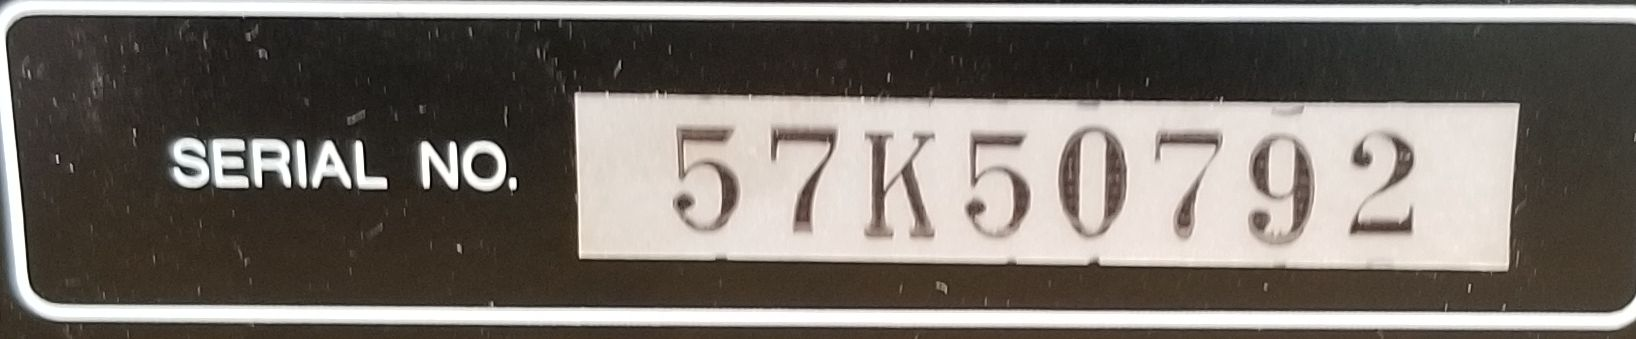 SN 6.jpg